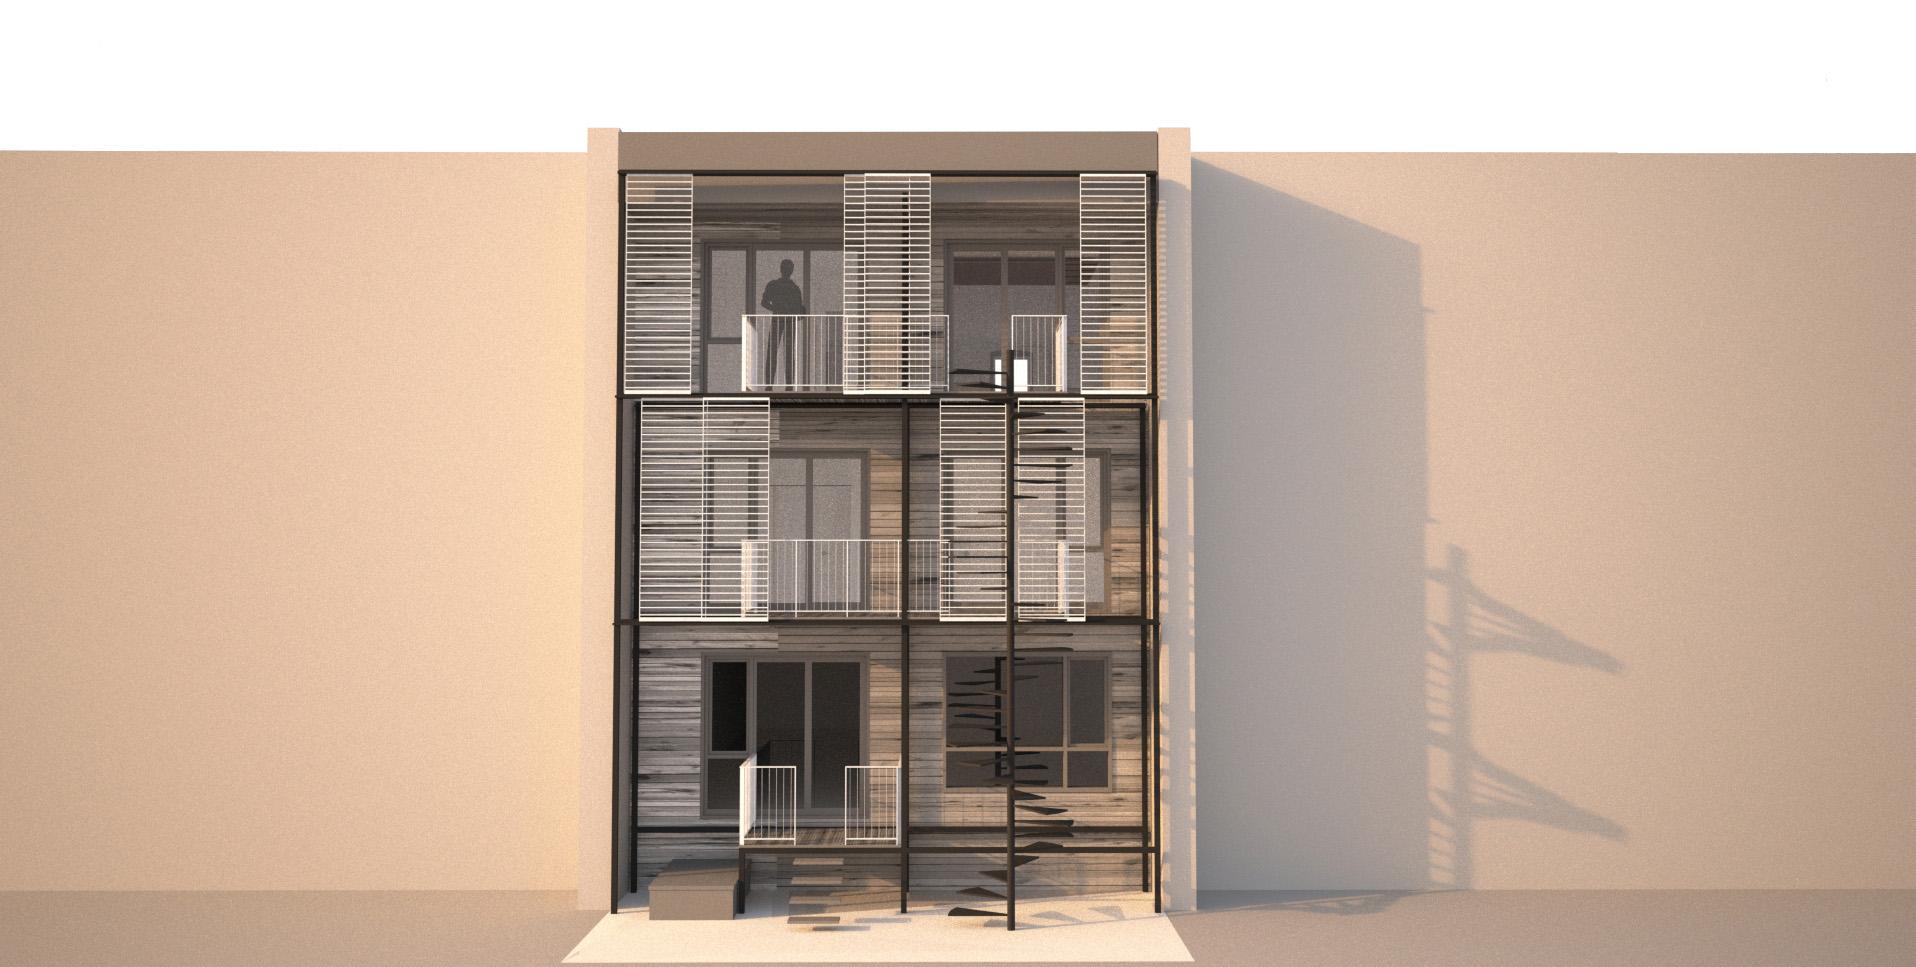 façade homa_4.jpg